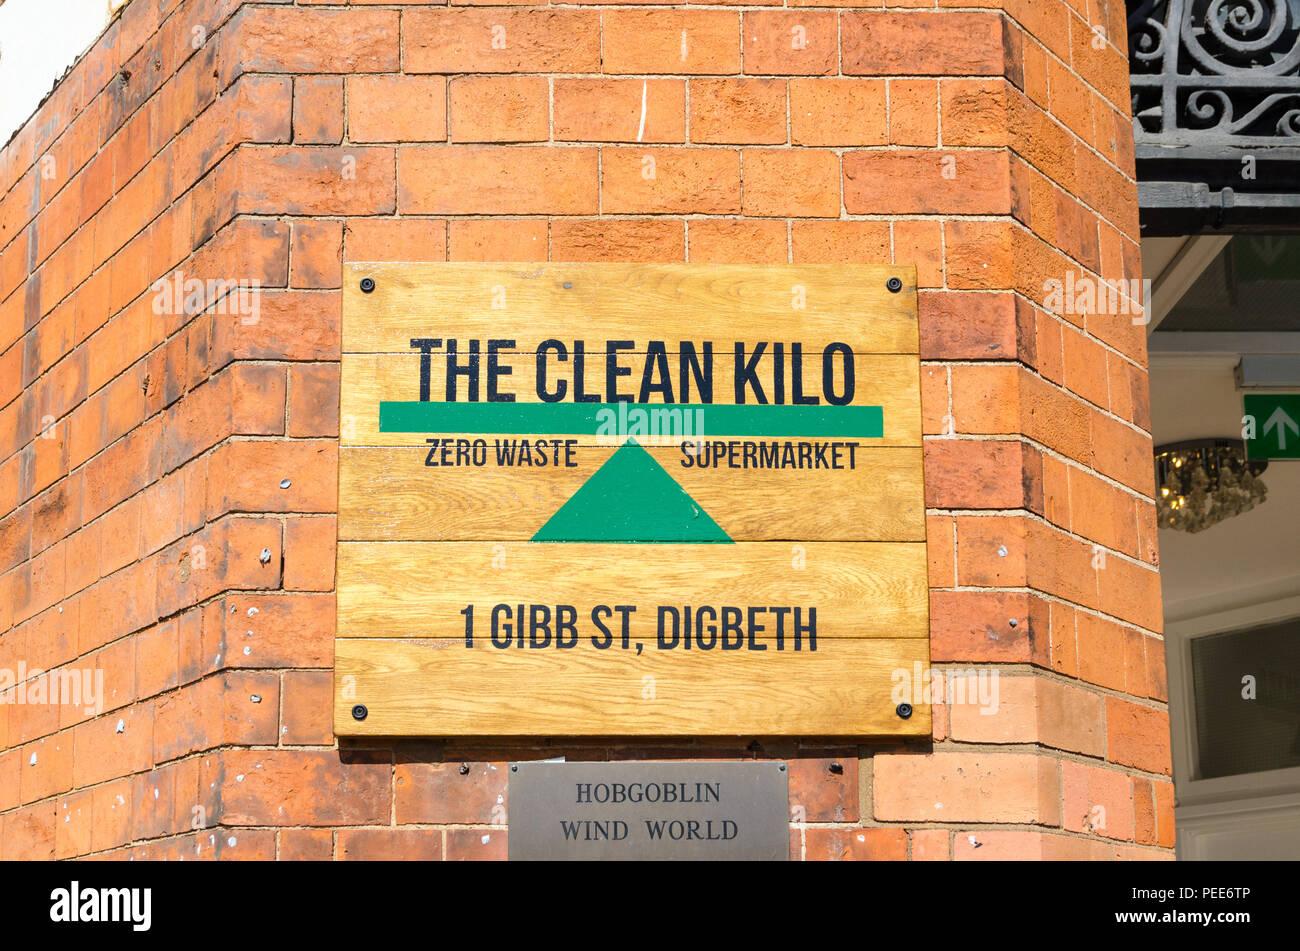 The Clean Kilo zero waste supermarket and food shop in Gibb Street, Digbeth, Birmingham - Stock Image